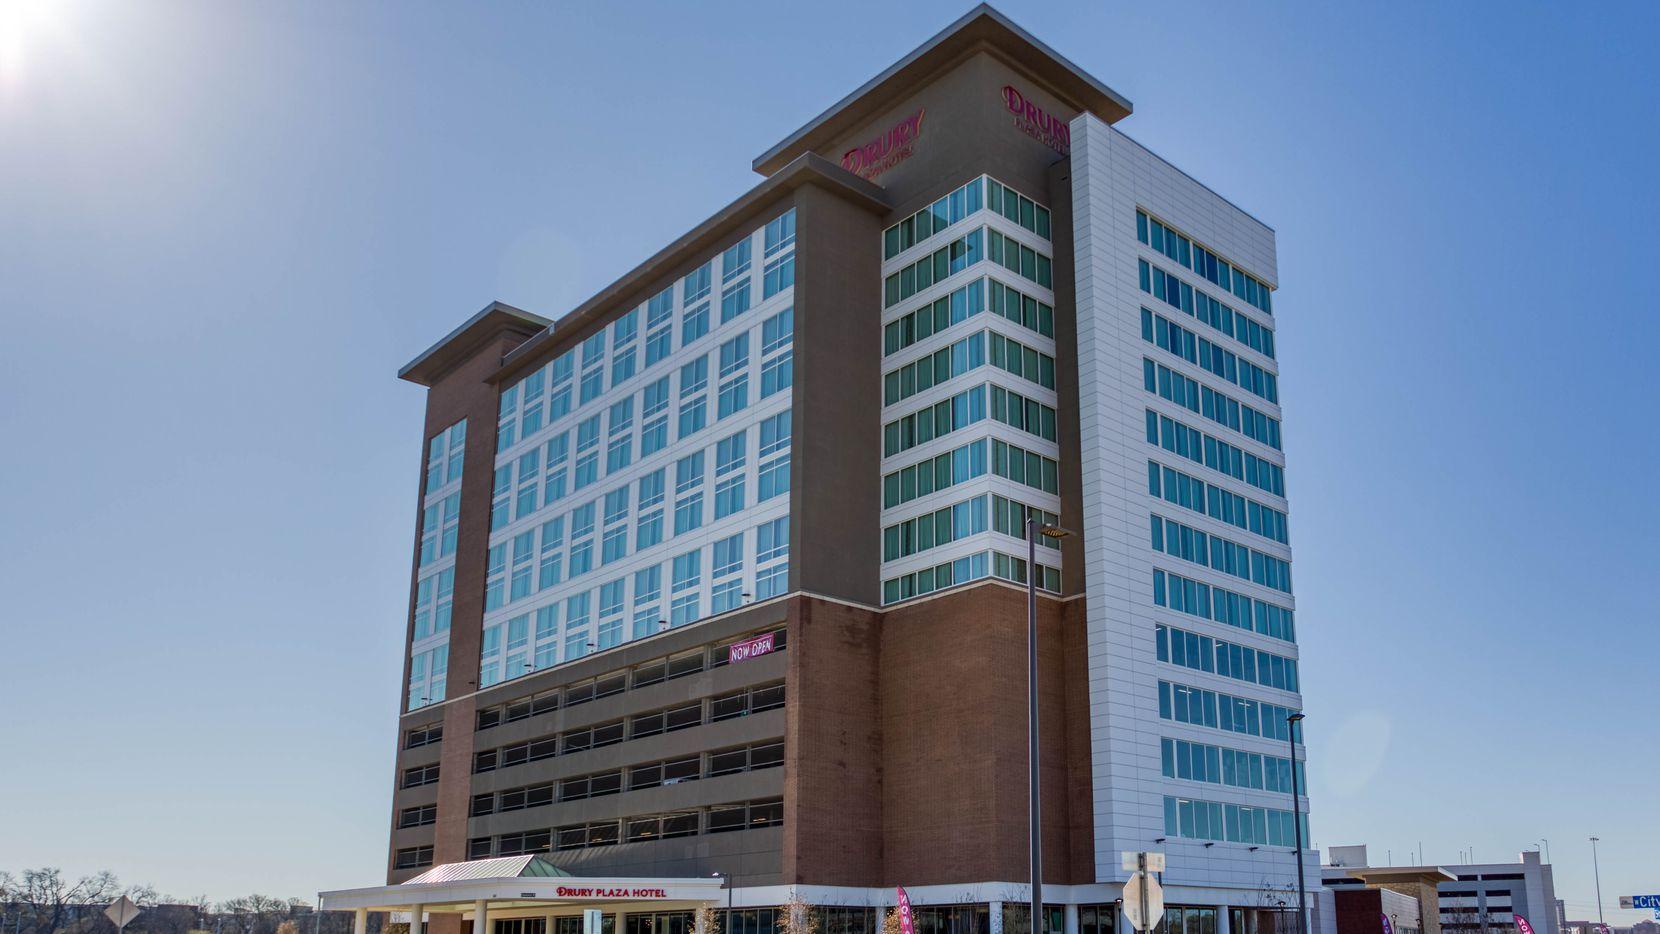 The new Richardson Hotel is on U.S. 75.